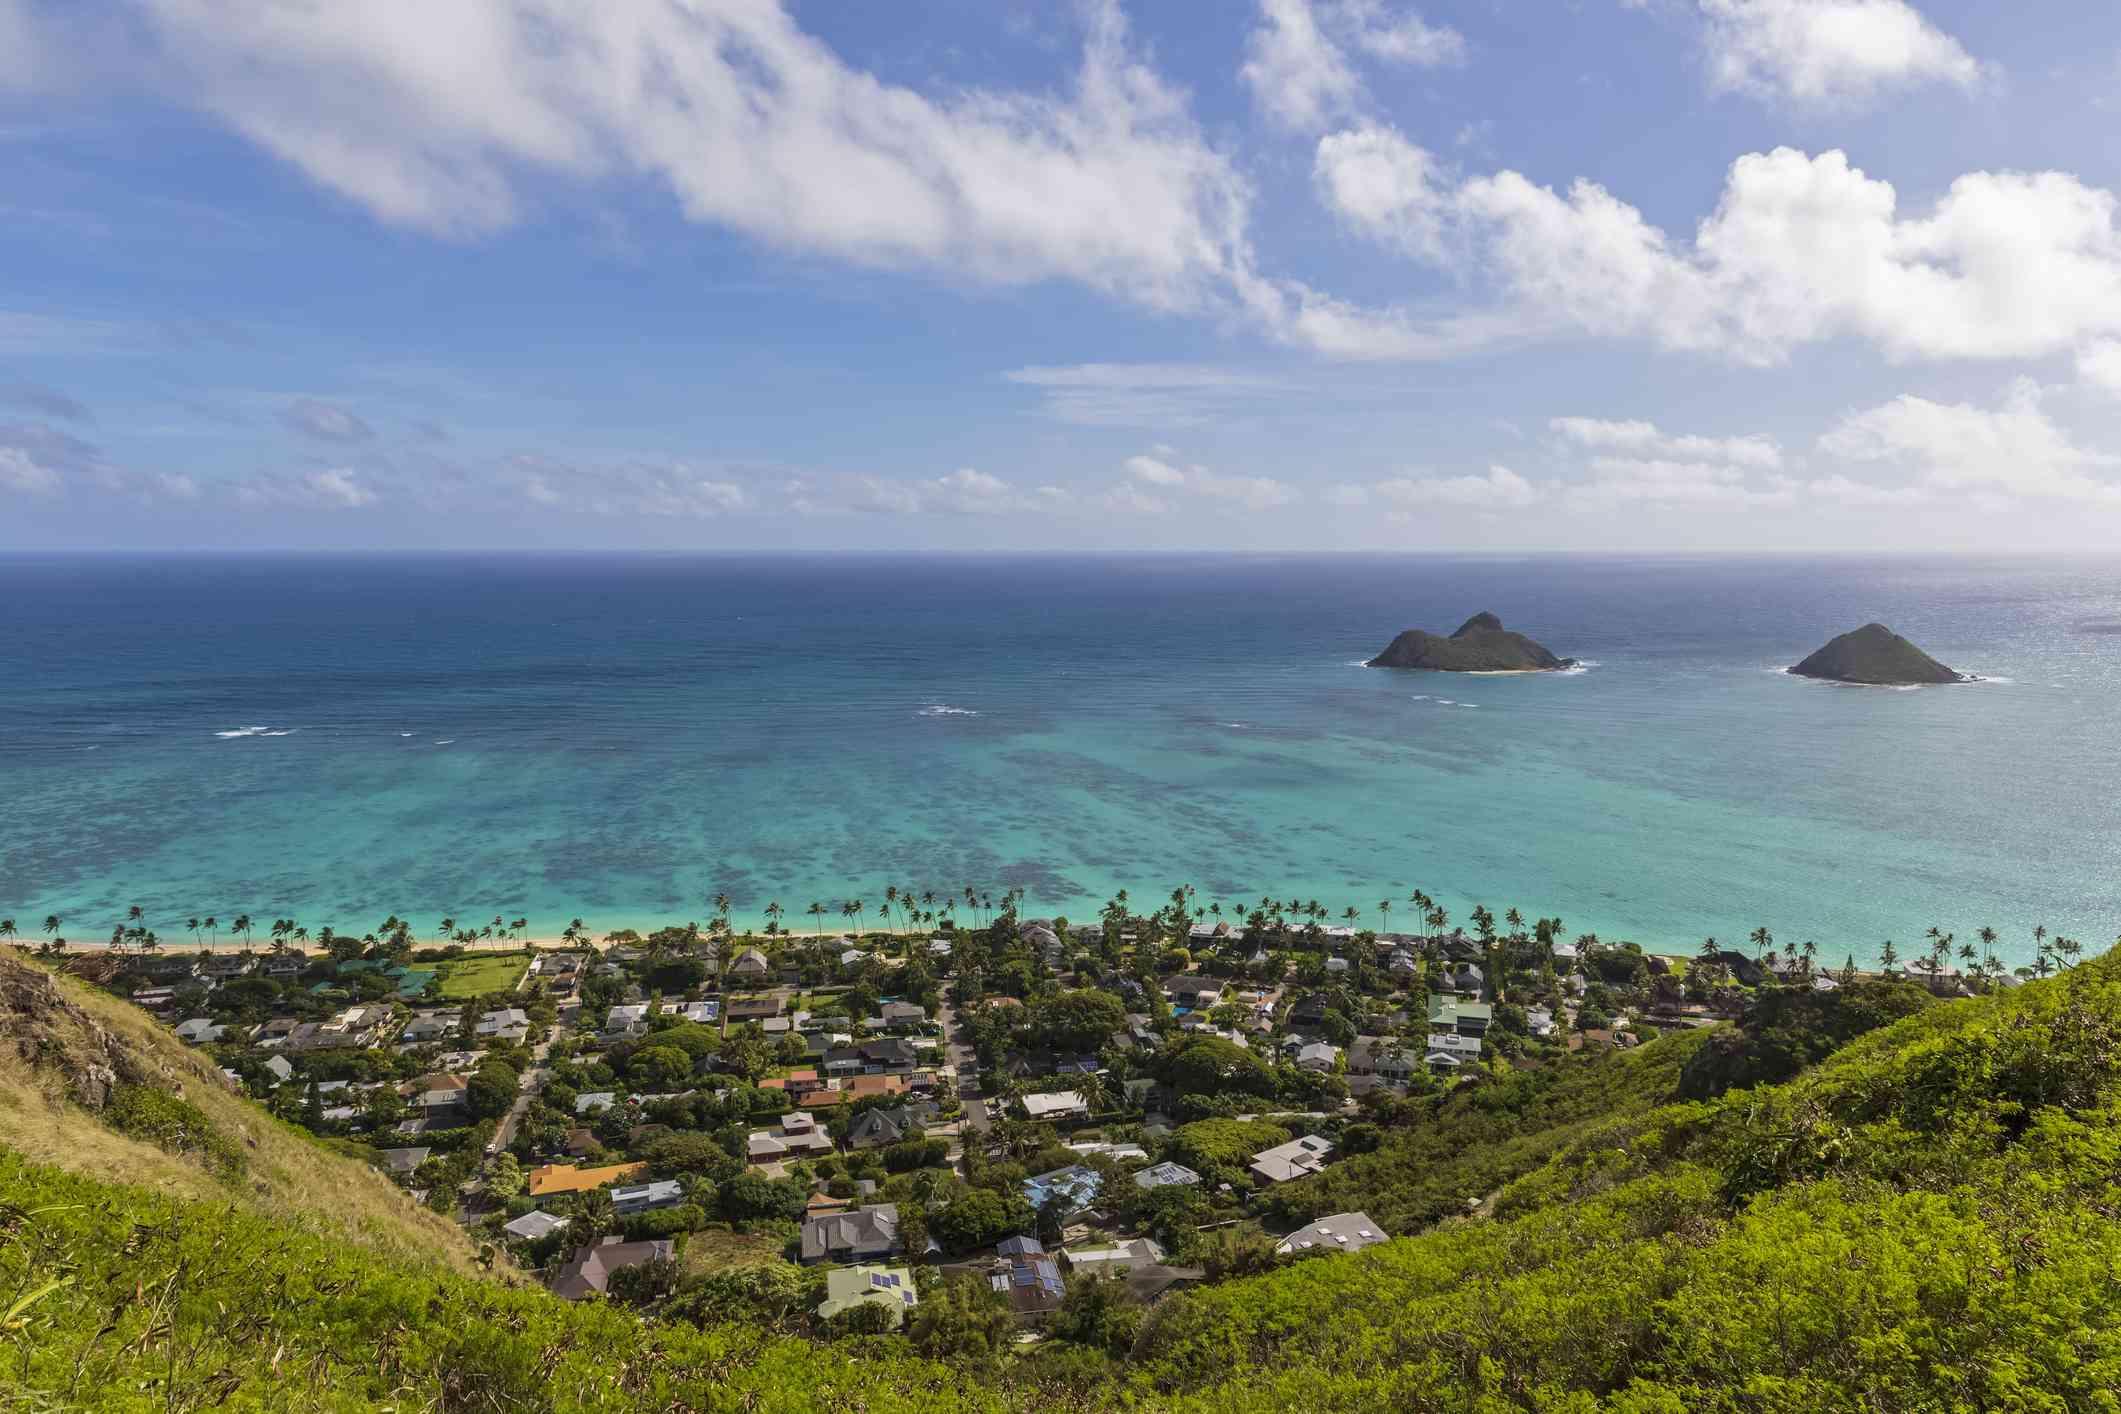 USA, Hawaii, Oahu, Kailua, View from Lanikai Pillbox Trail, Kaiwa Ridge Trail, to Na Mokulua, the Twin Islands